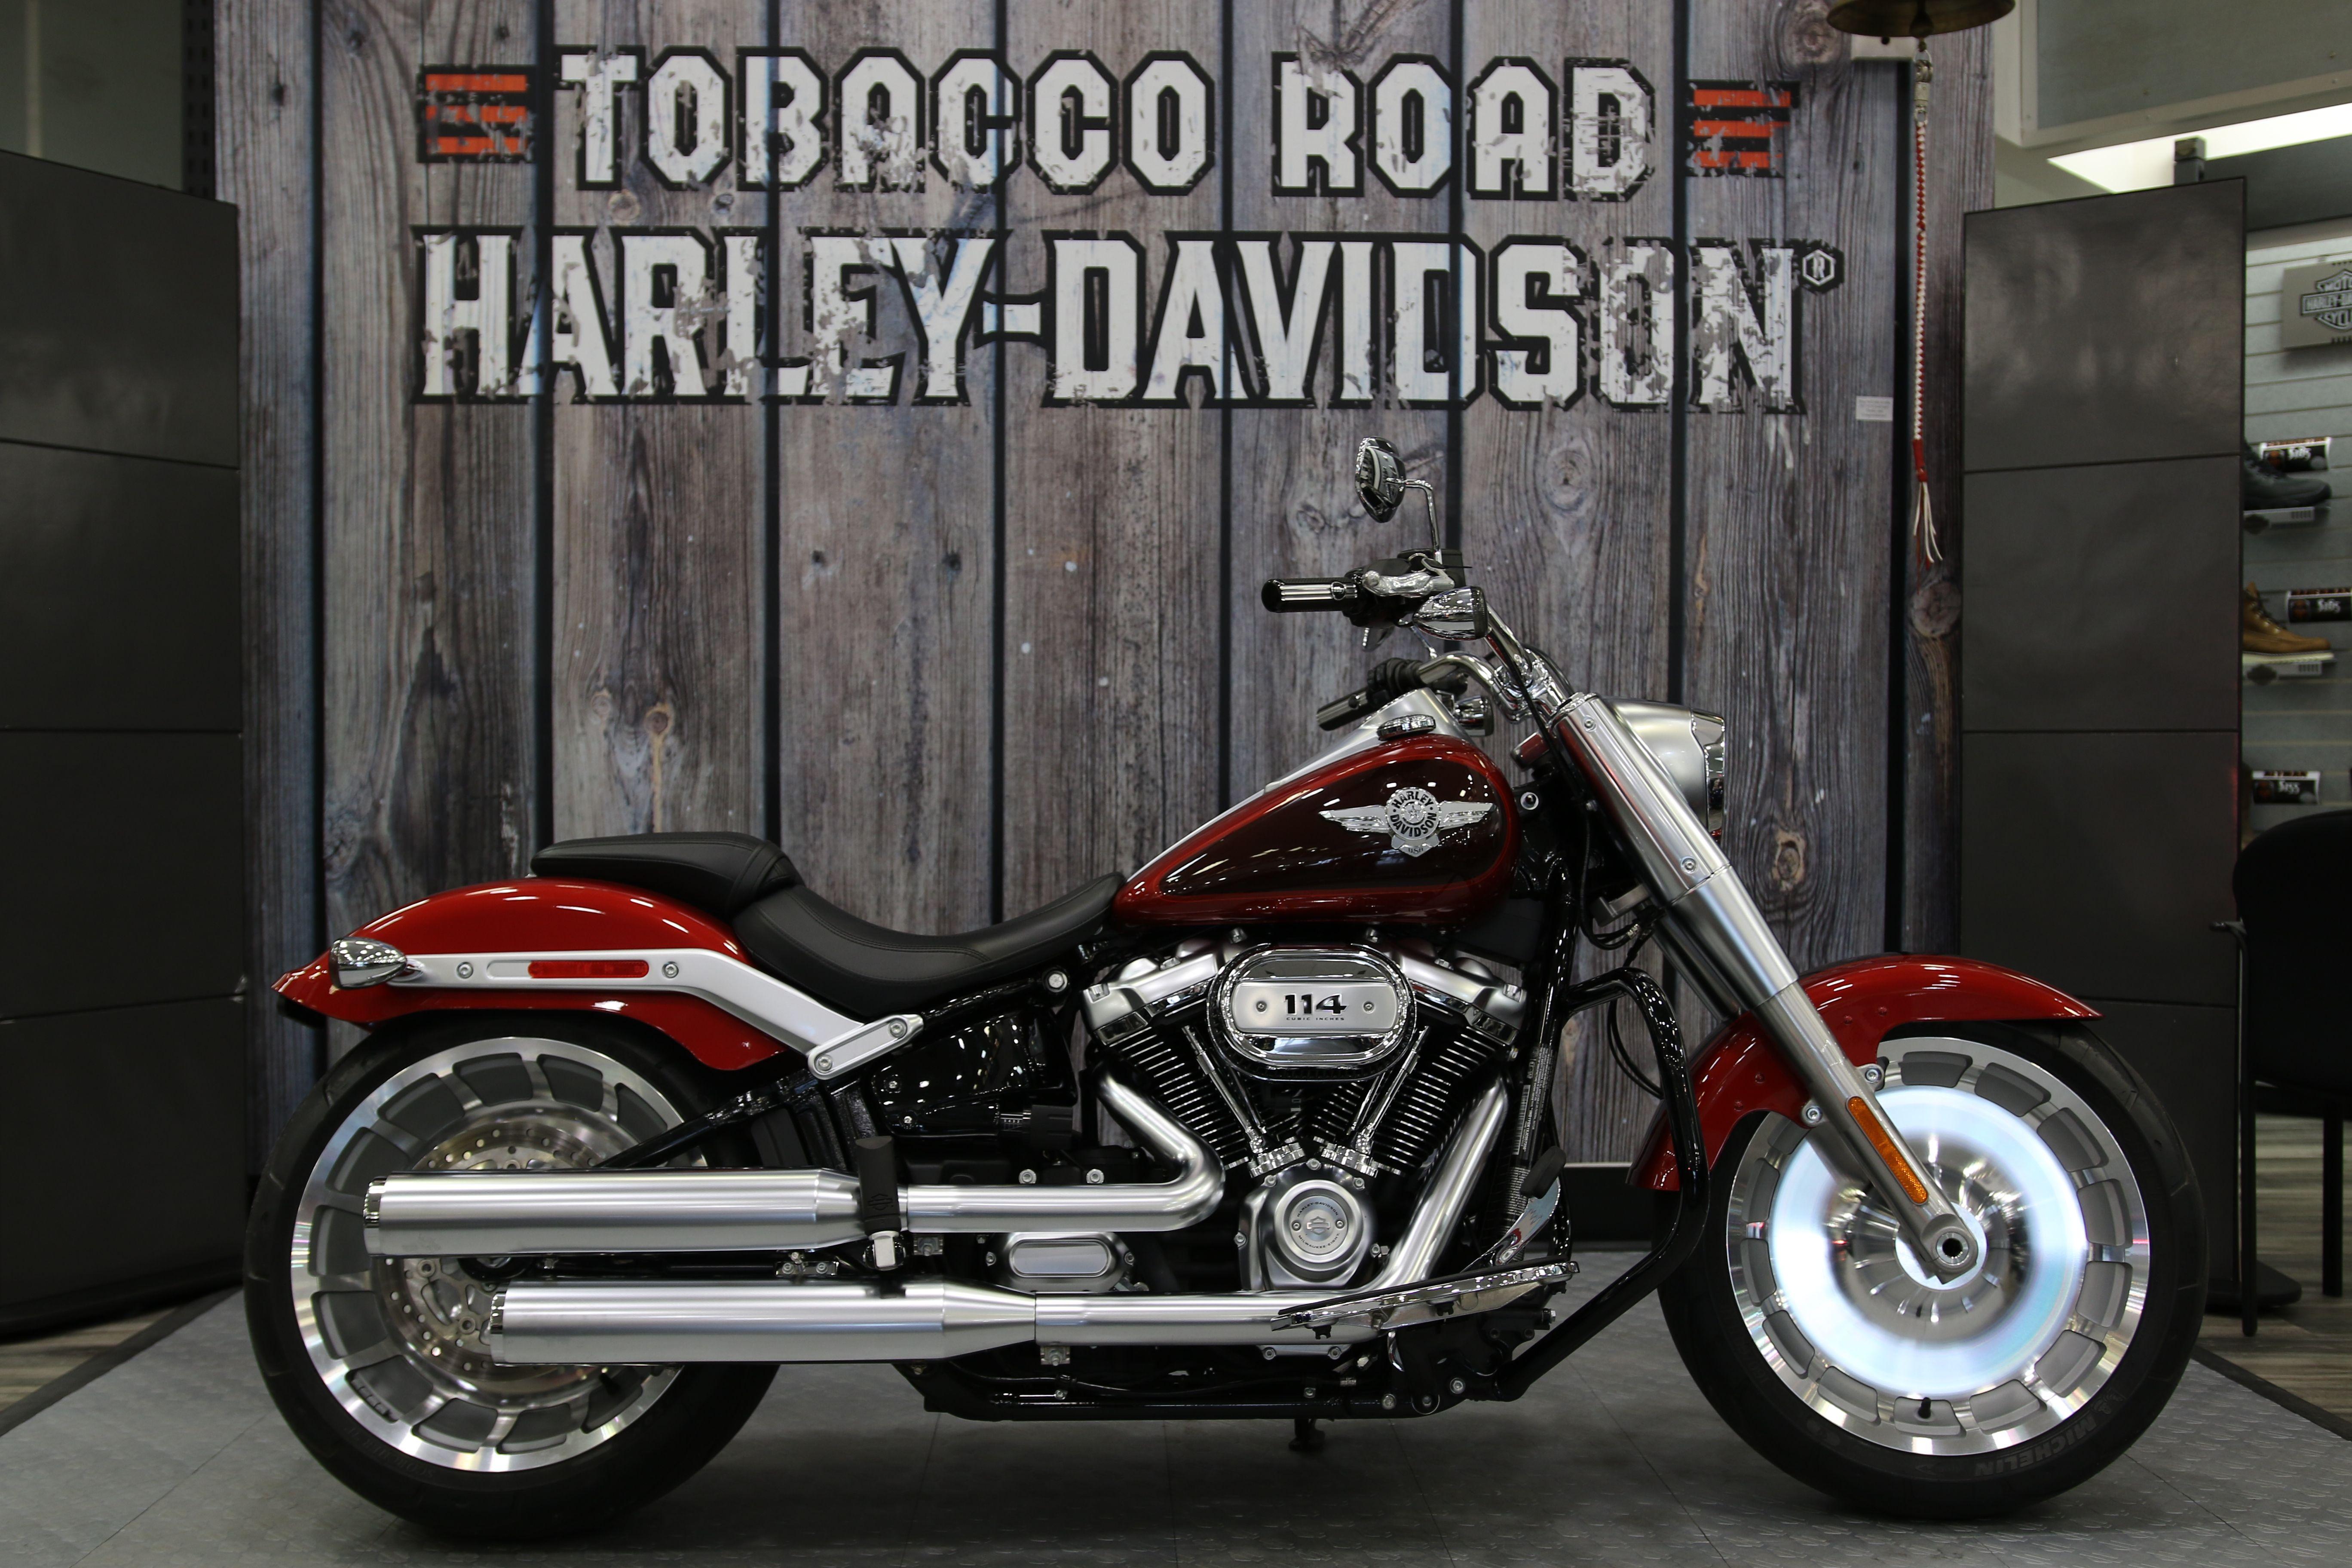 2018 Harley-Davidson Fat Boy 114